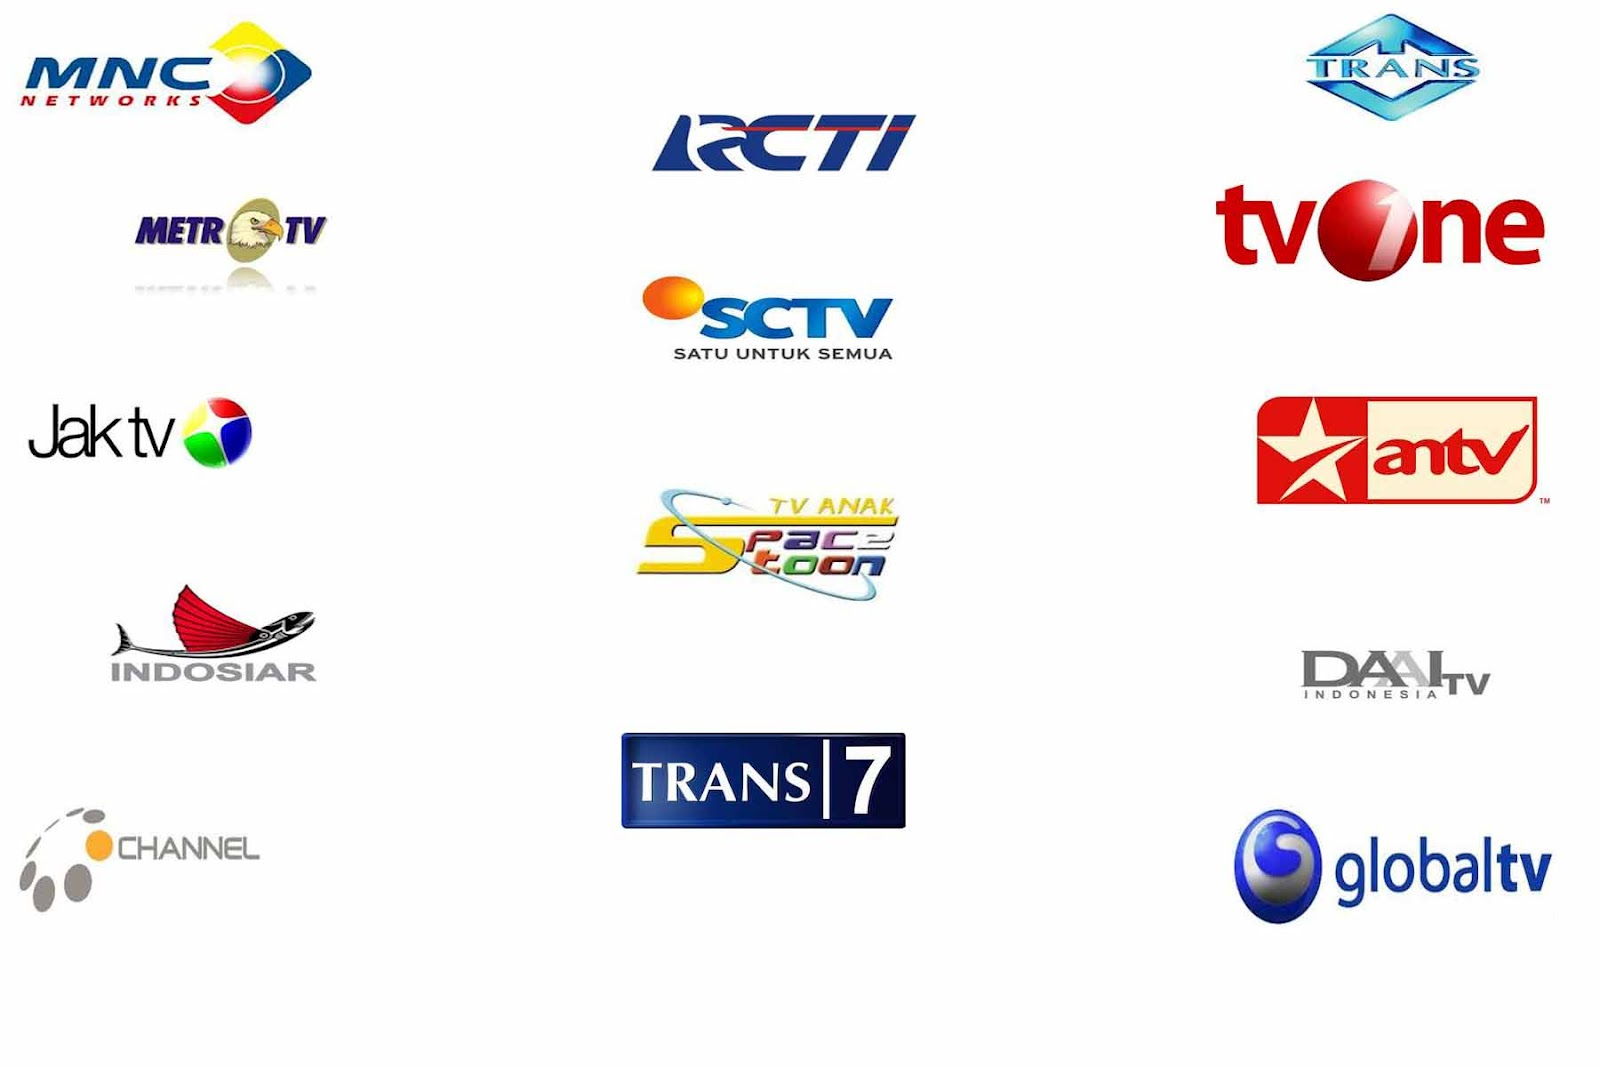 Tv streaming lewat internet saluran channel tv muatan lokal indonesia